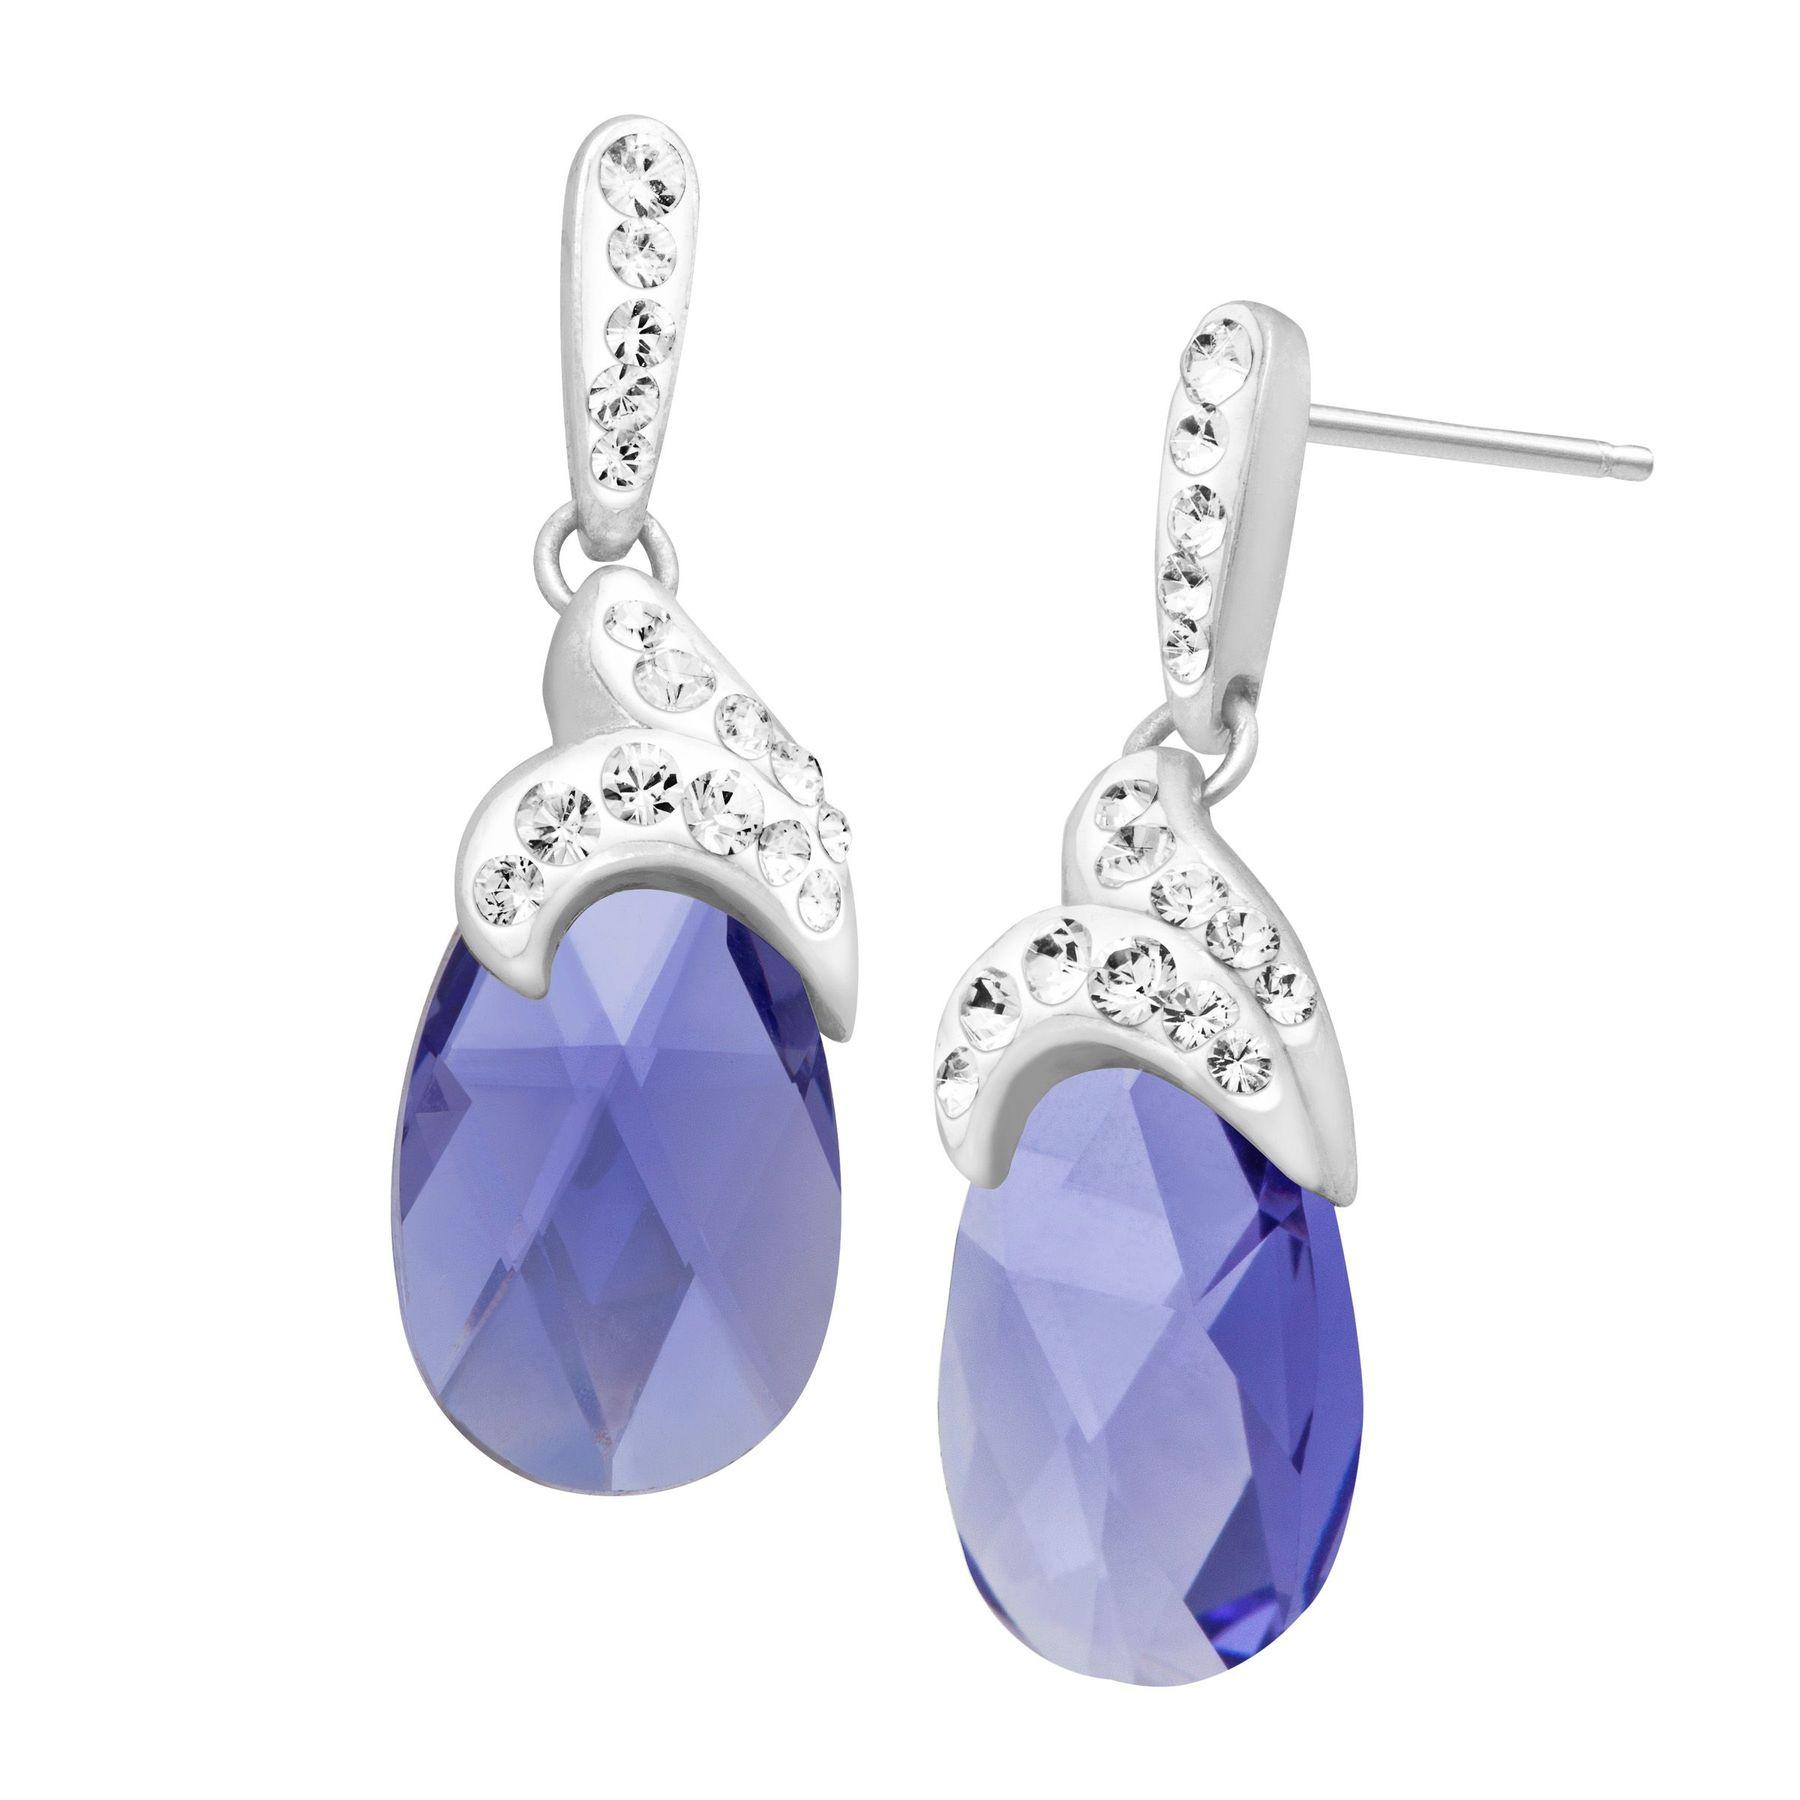 Drop Earrings With Lavender Swarovski Crystal In Sterling Silver